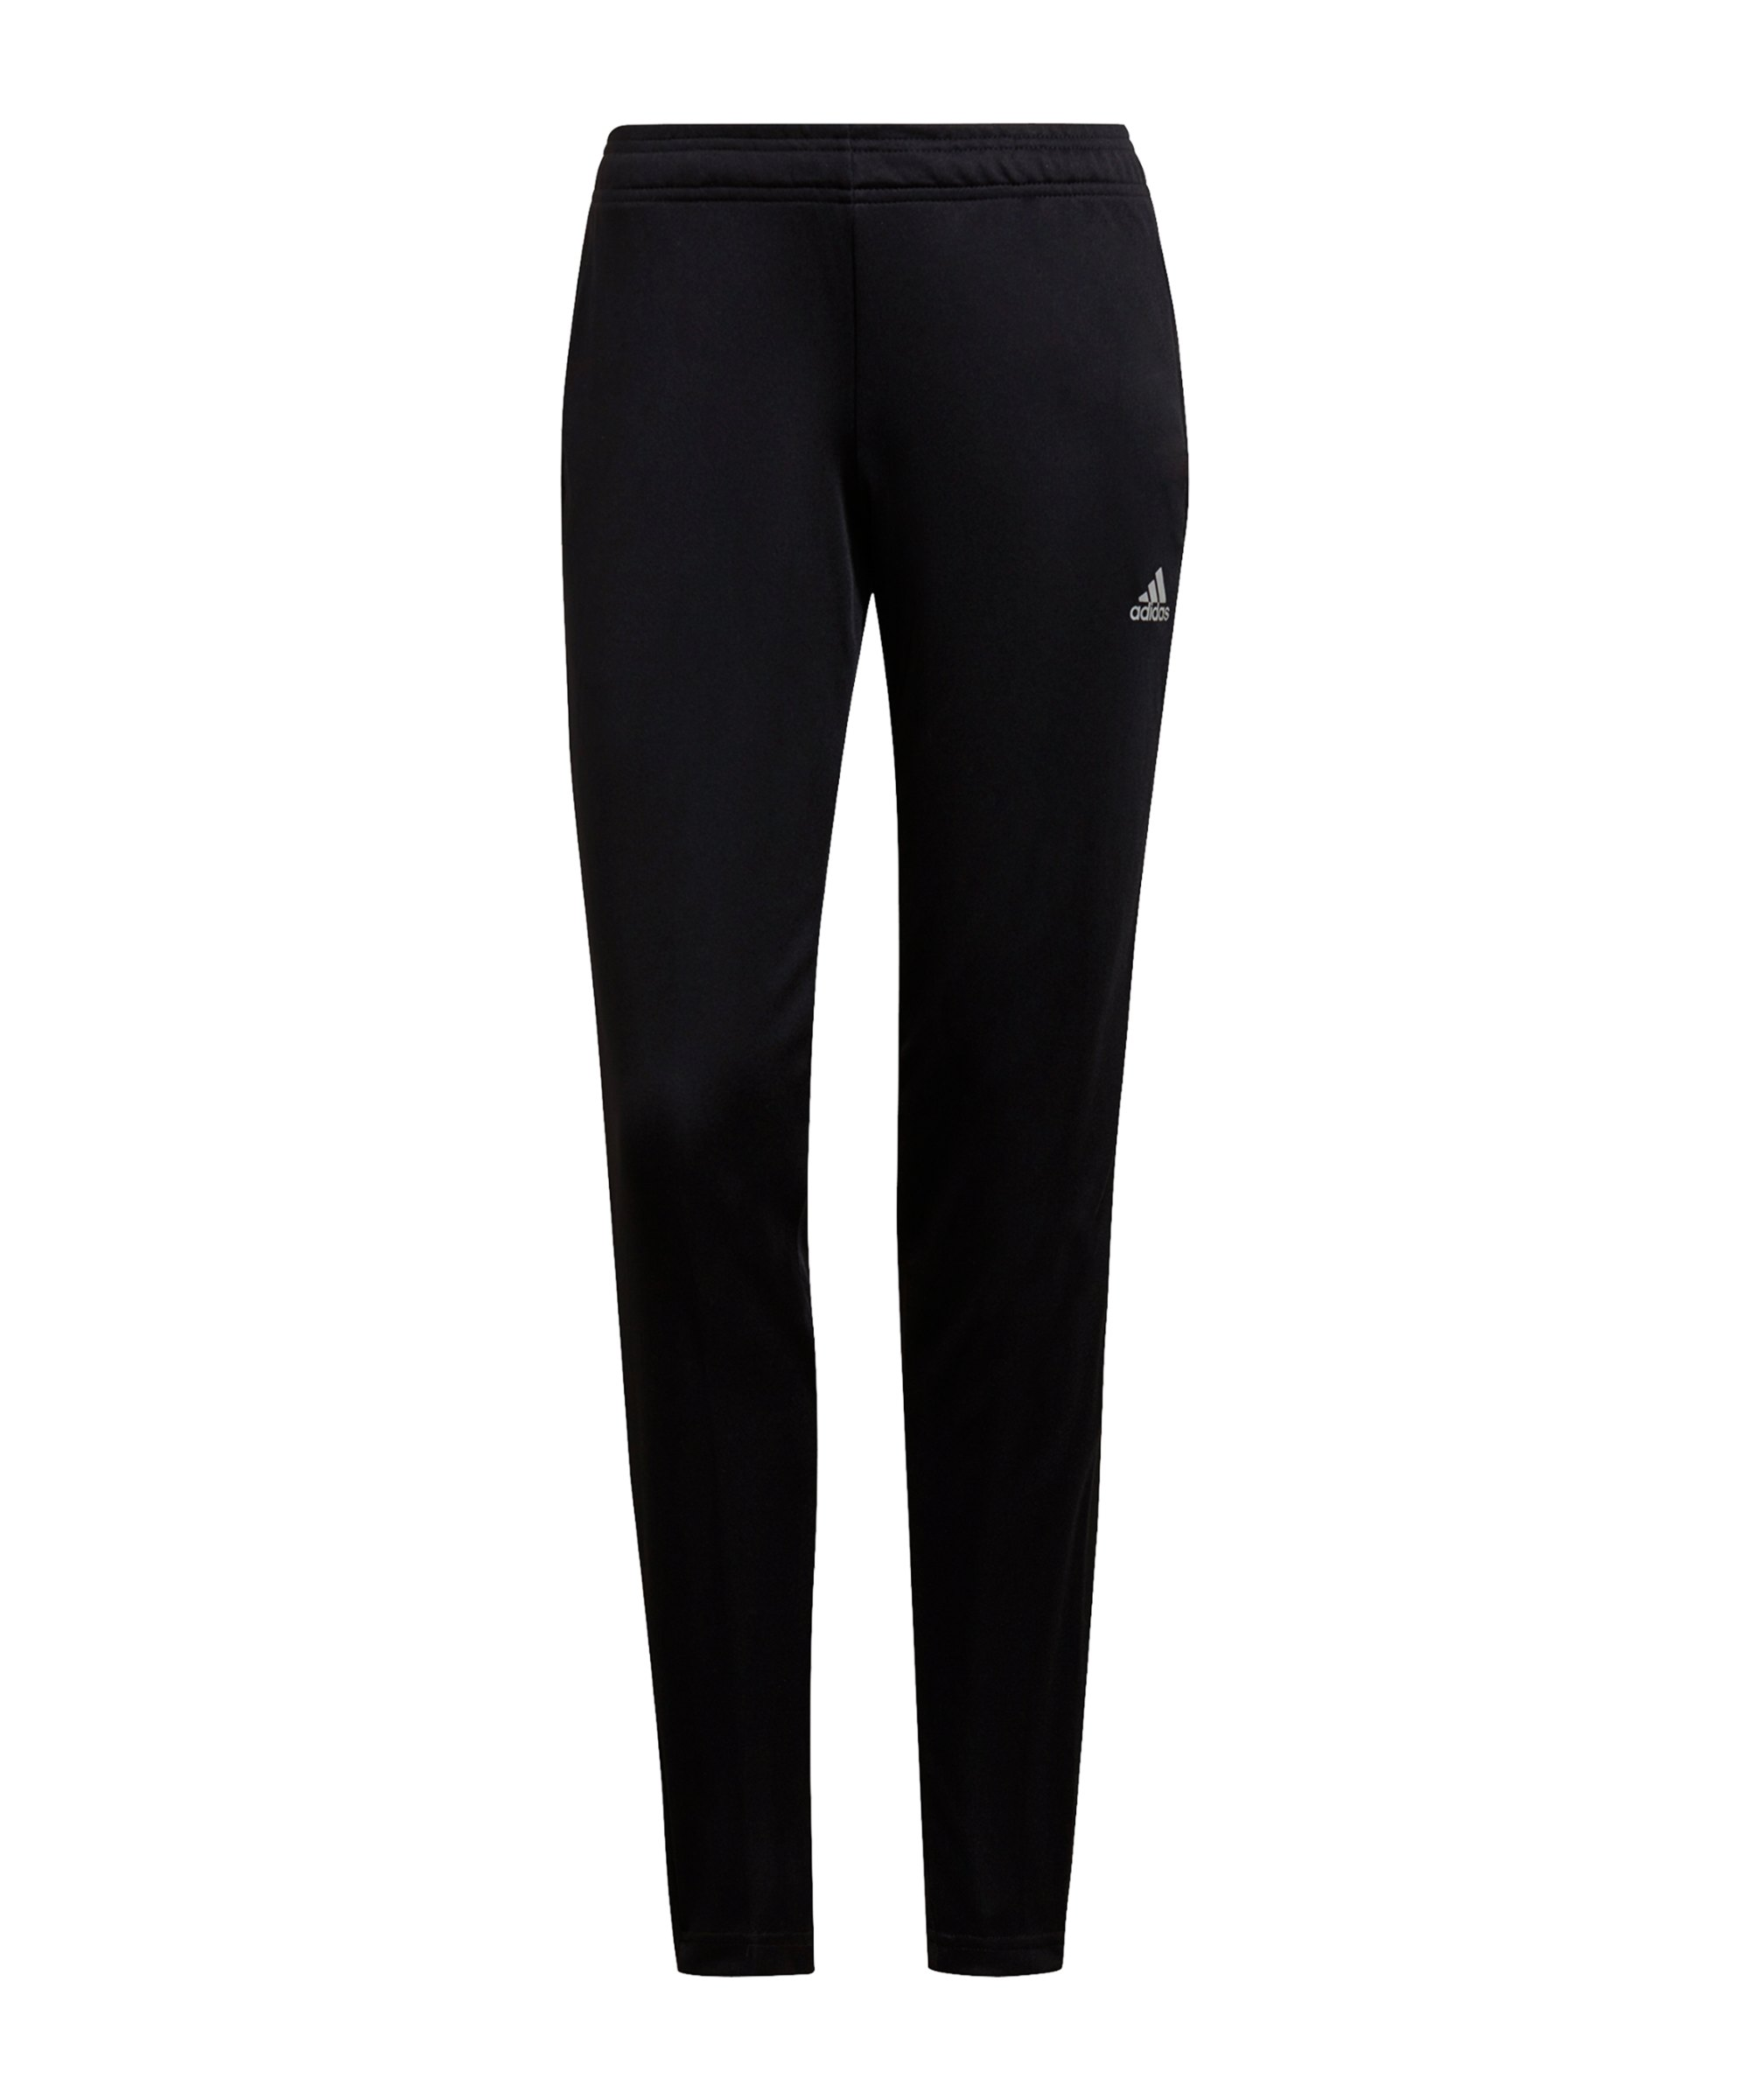 adidas Tiro Reflective Trainingshose Damen Schwarz - schwarz